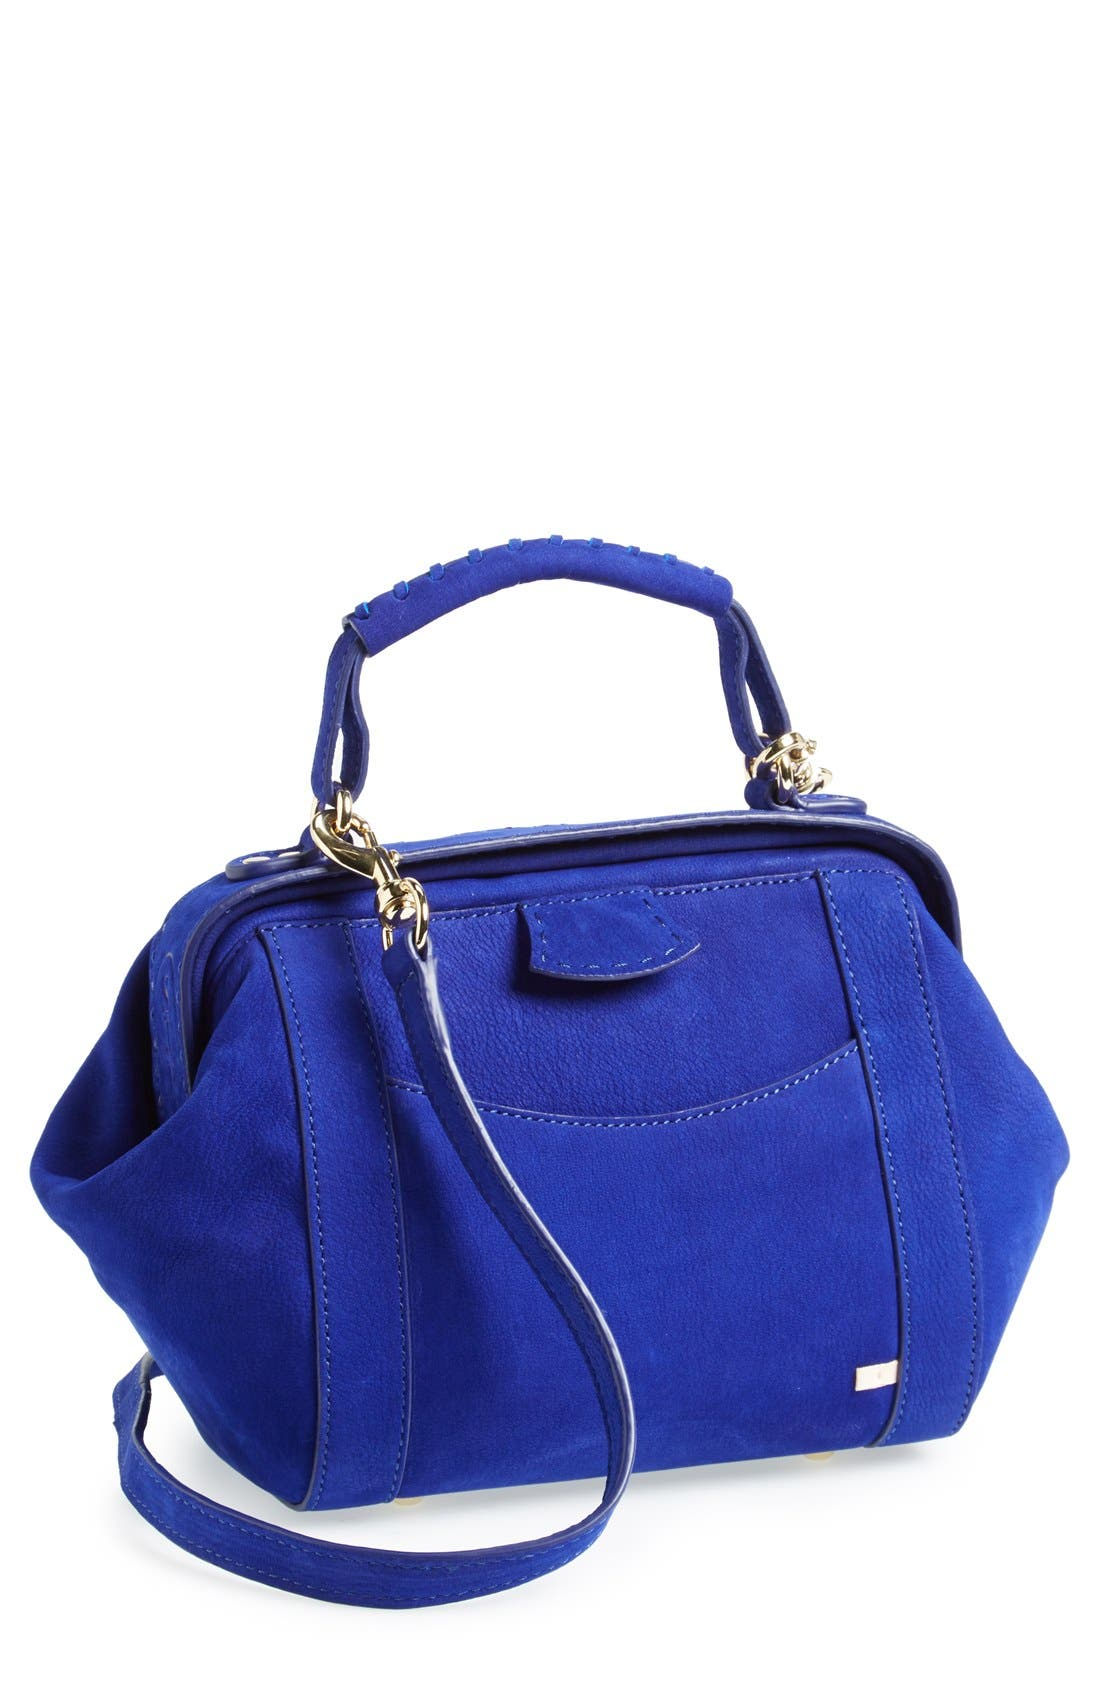 Alternate Image 1 Selected - SJP 'Waverly' Suede Crossbody Bag